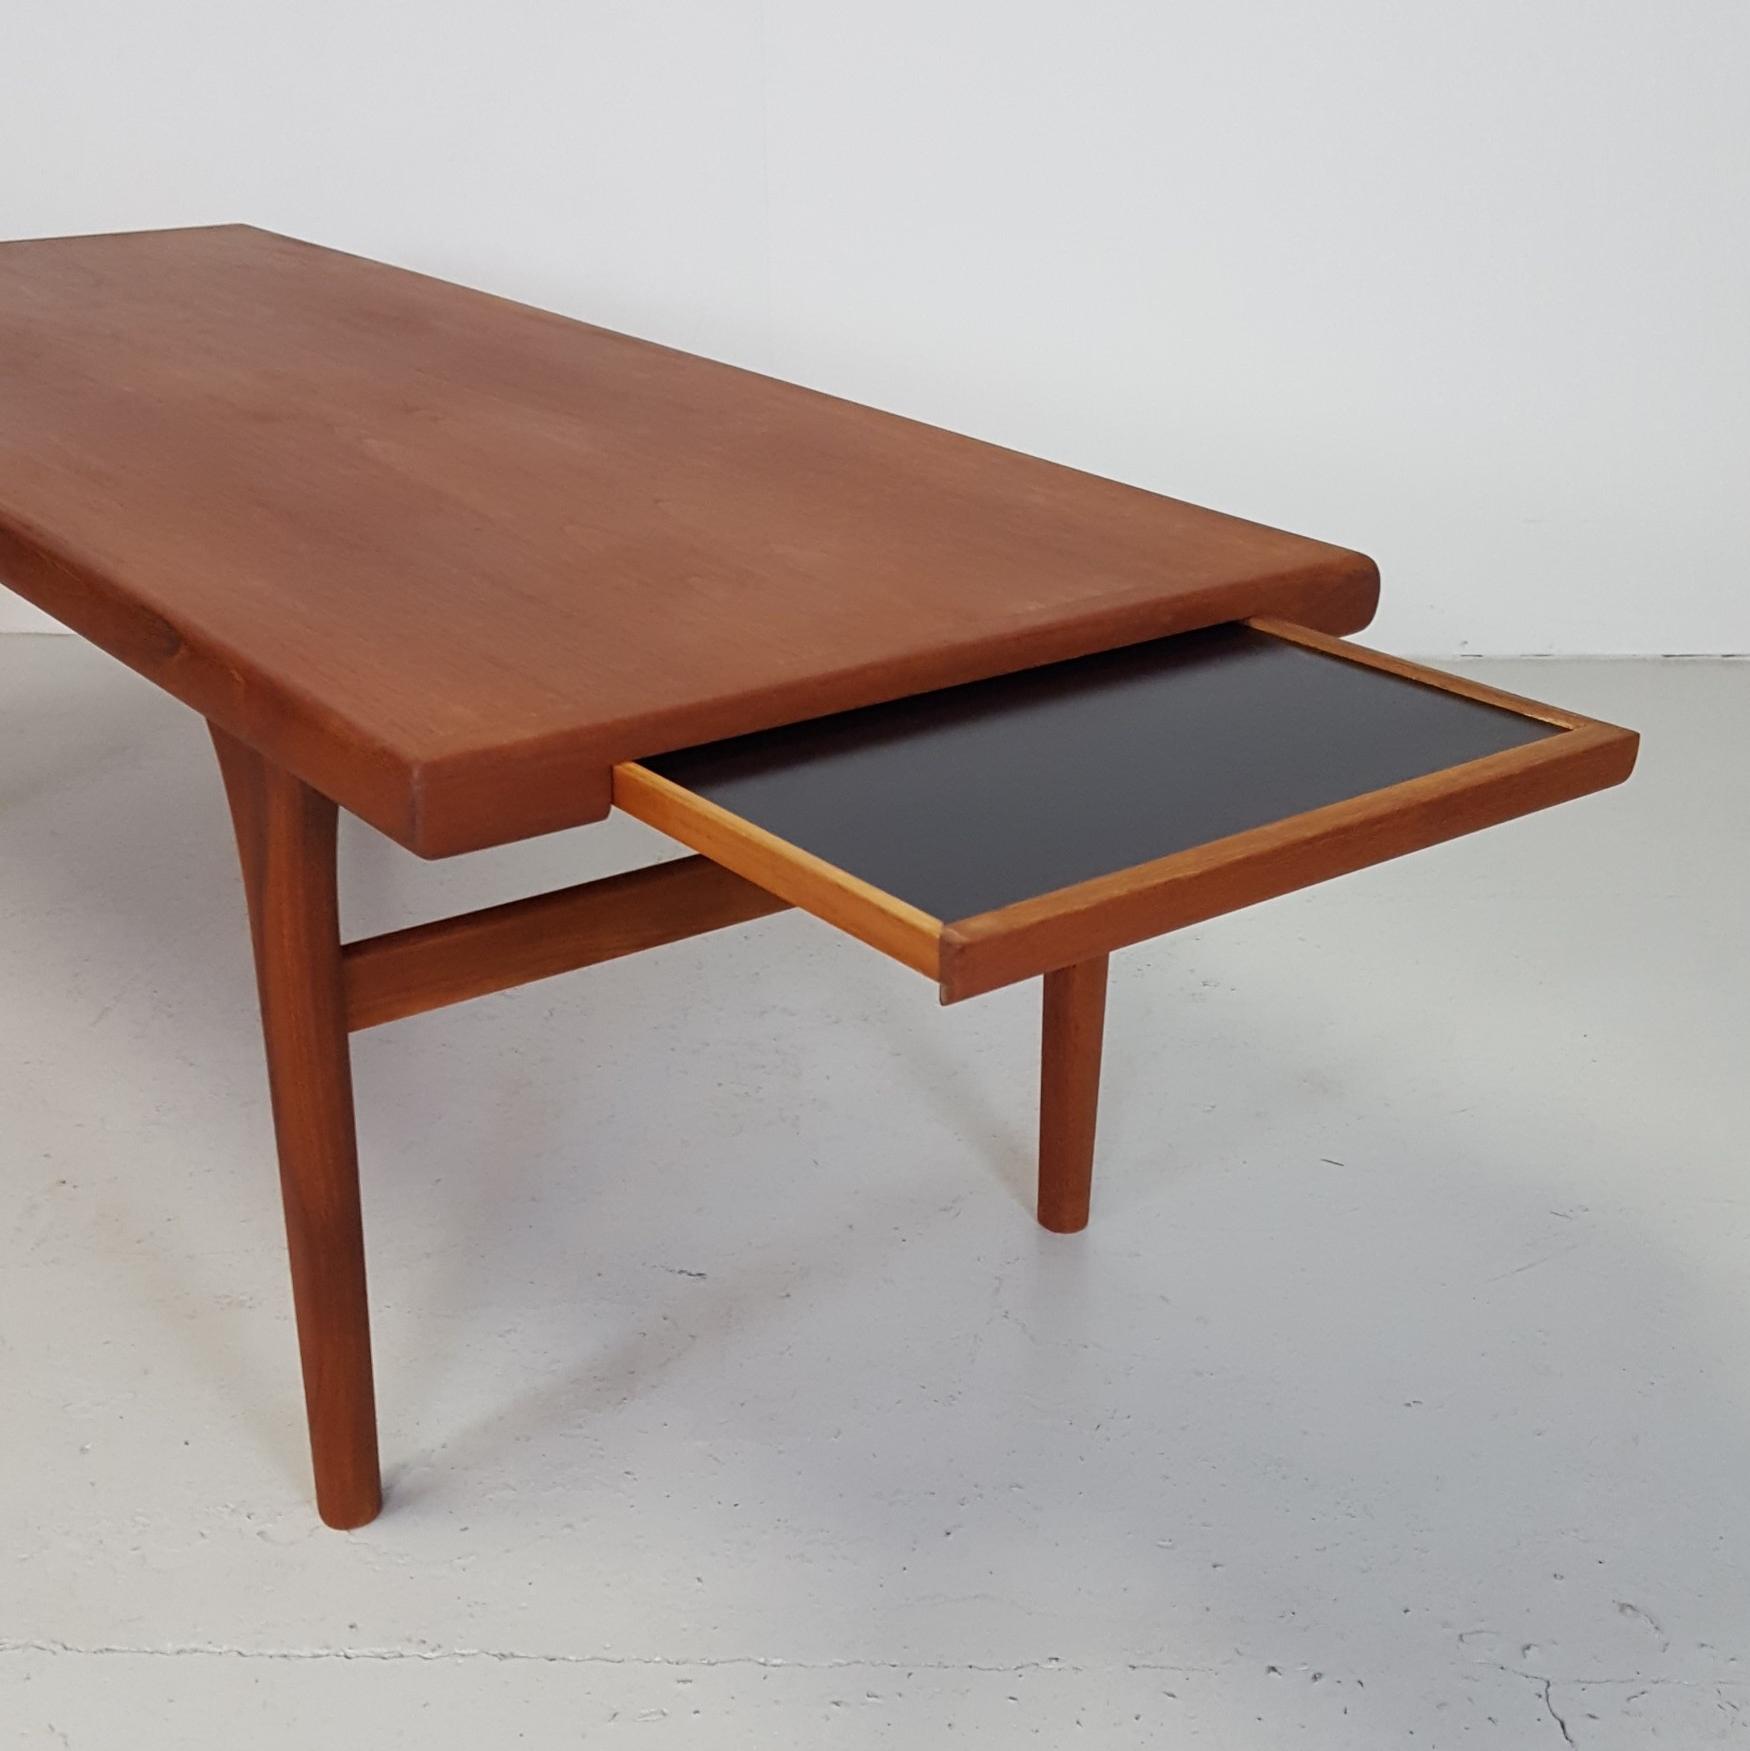 sofabord teak Sofabord i massiv Teak   Retrofabrikken sofabord teak